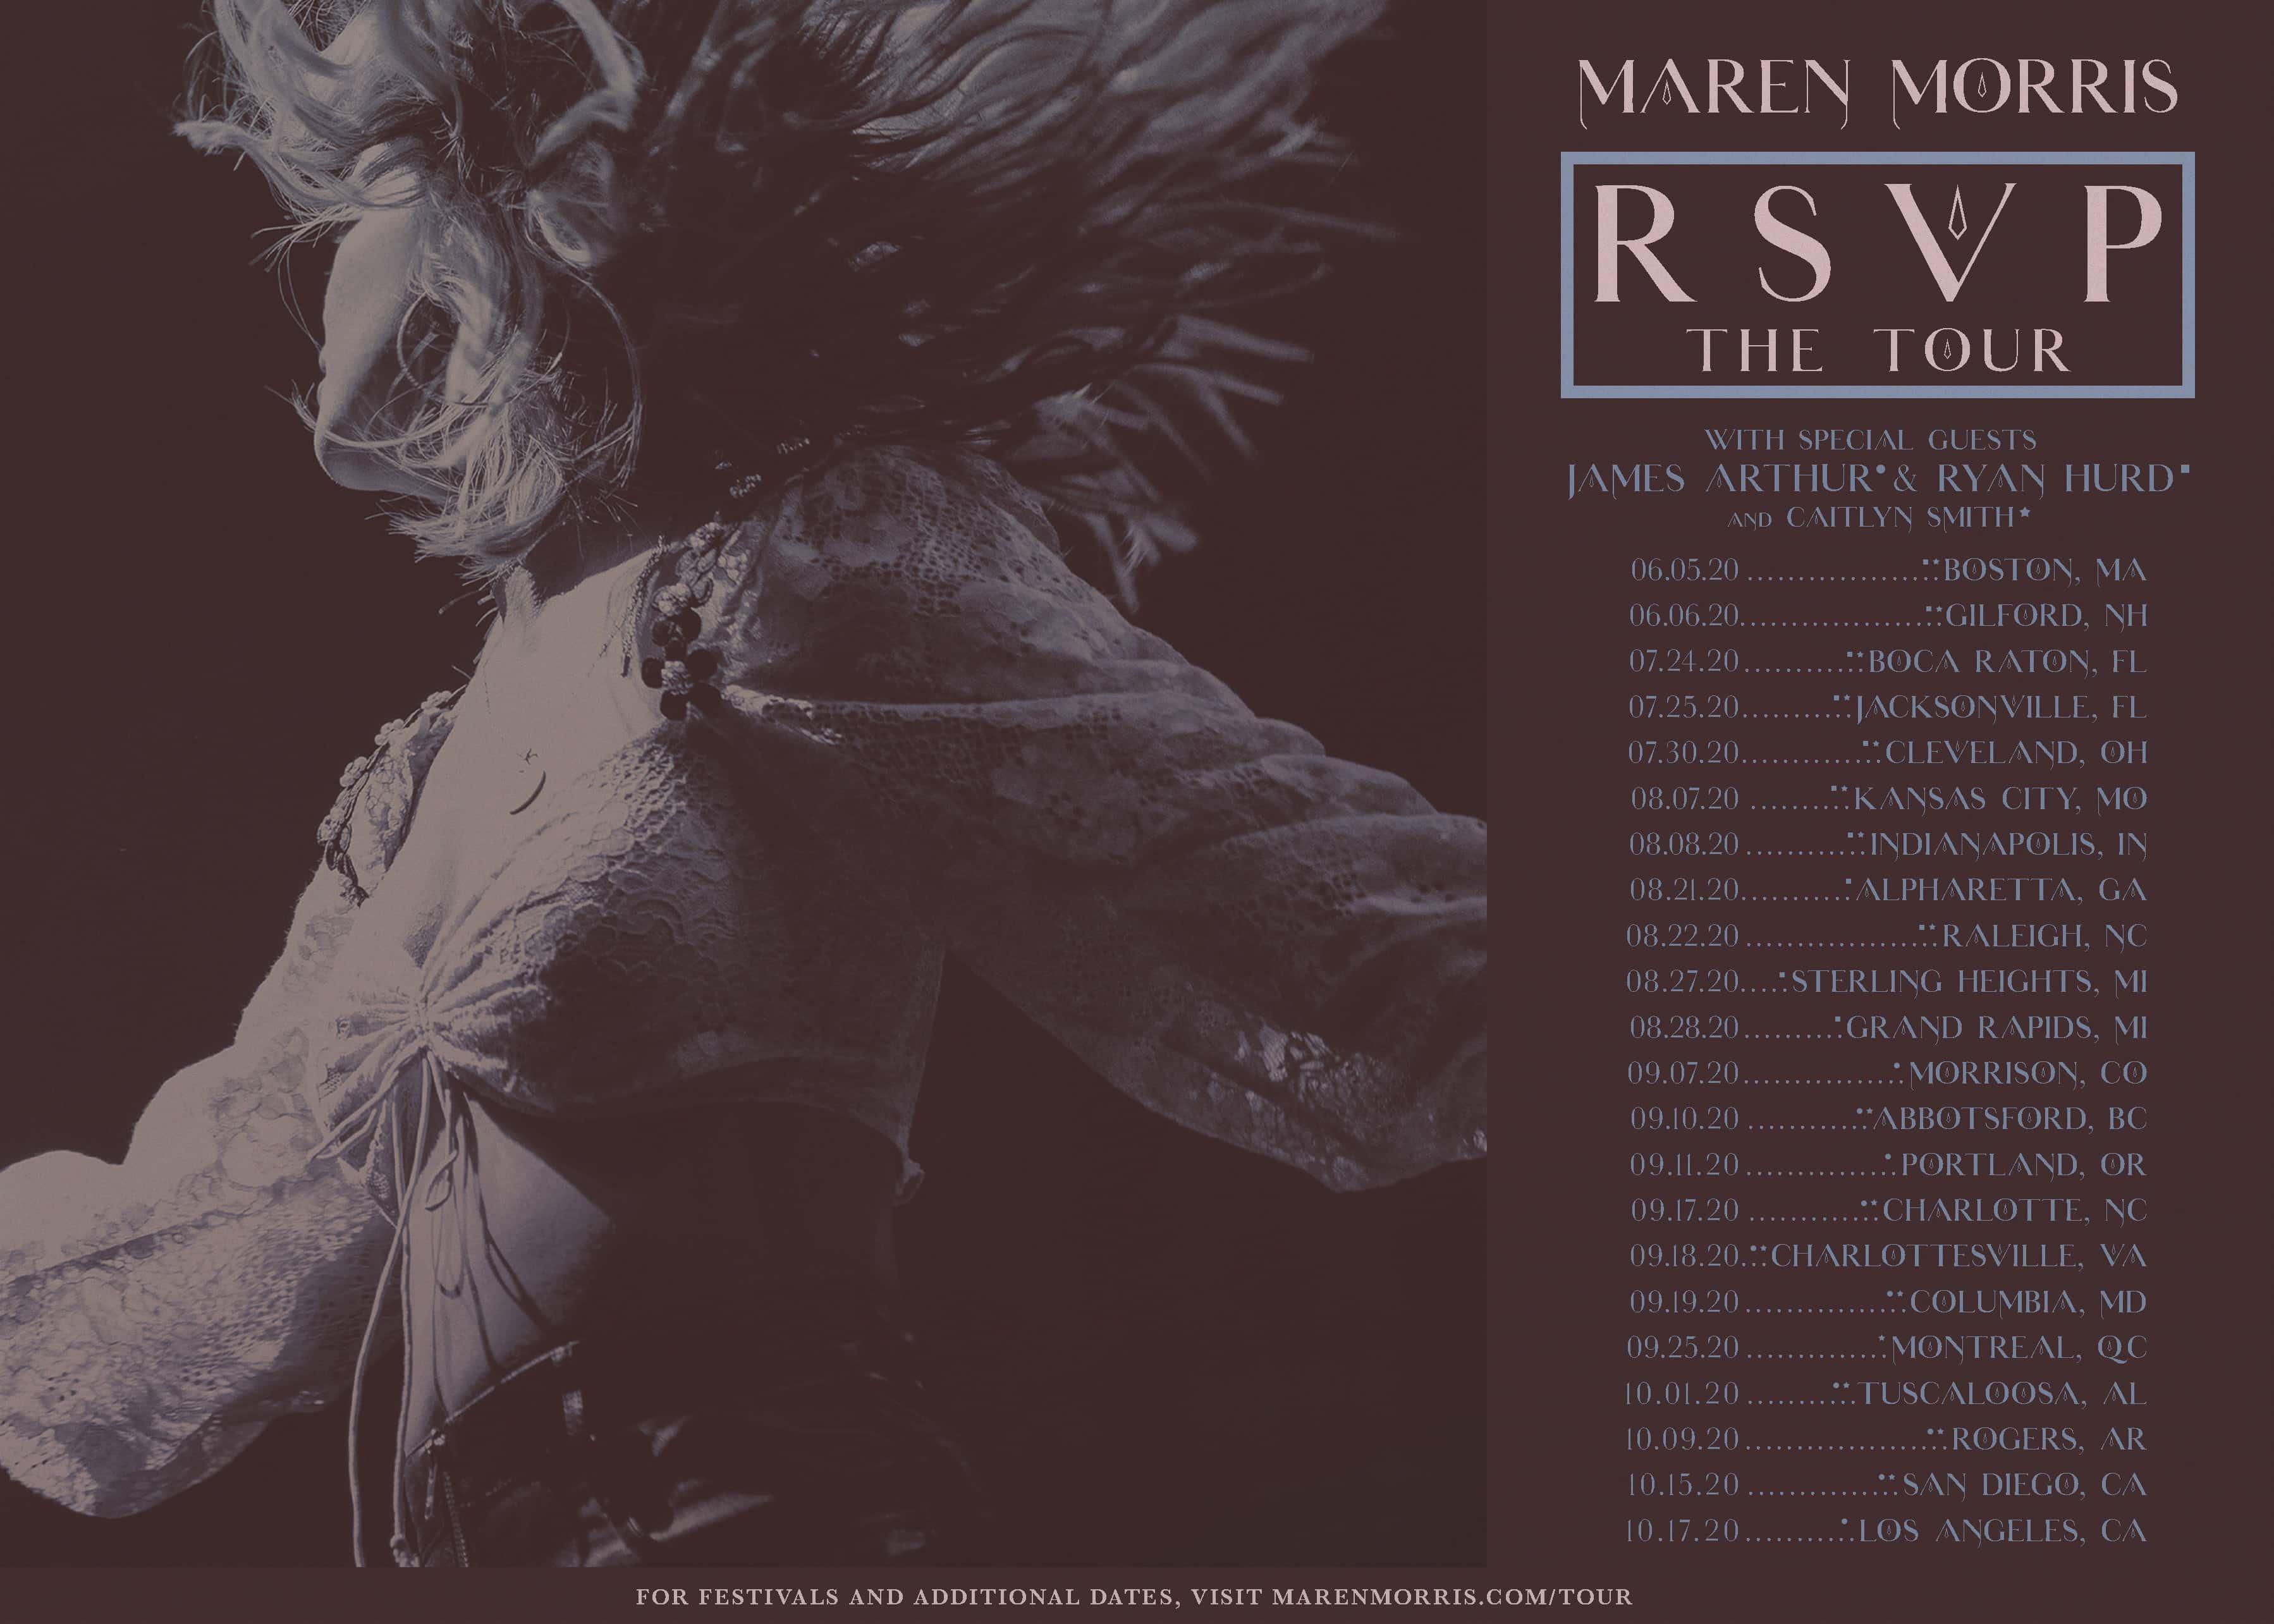 Maren Morris (on Left) with her RSVP Tour Dates